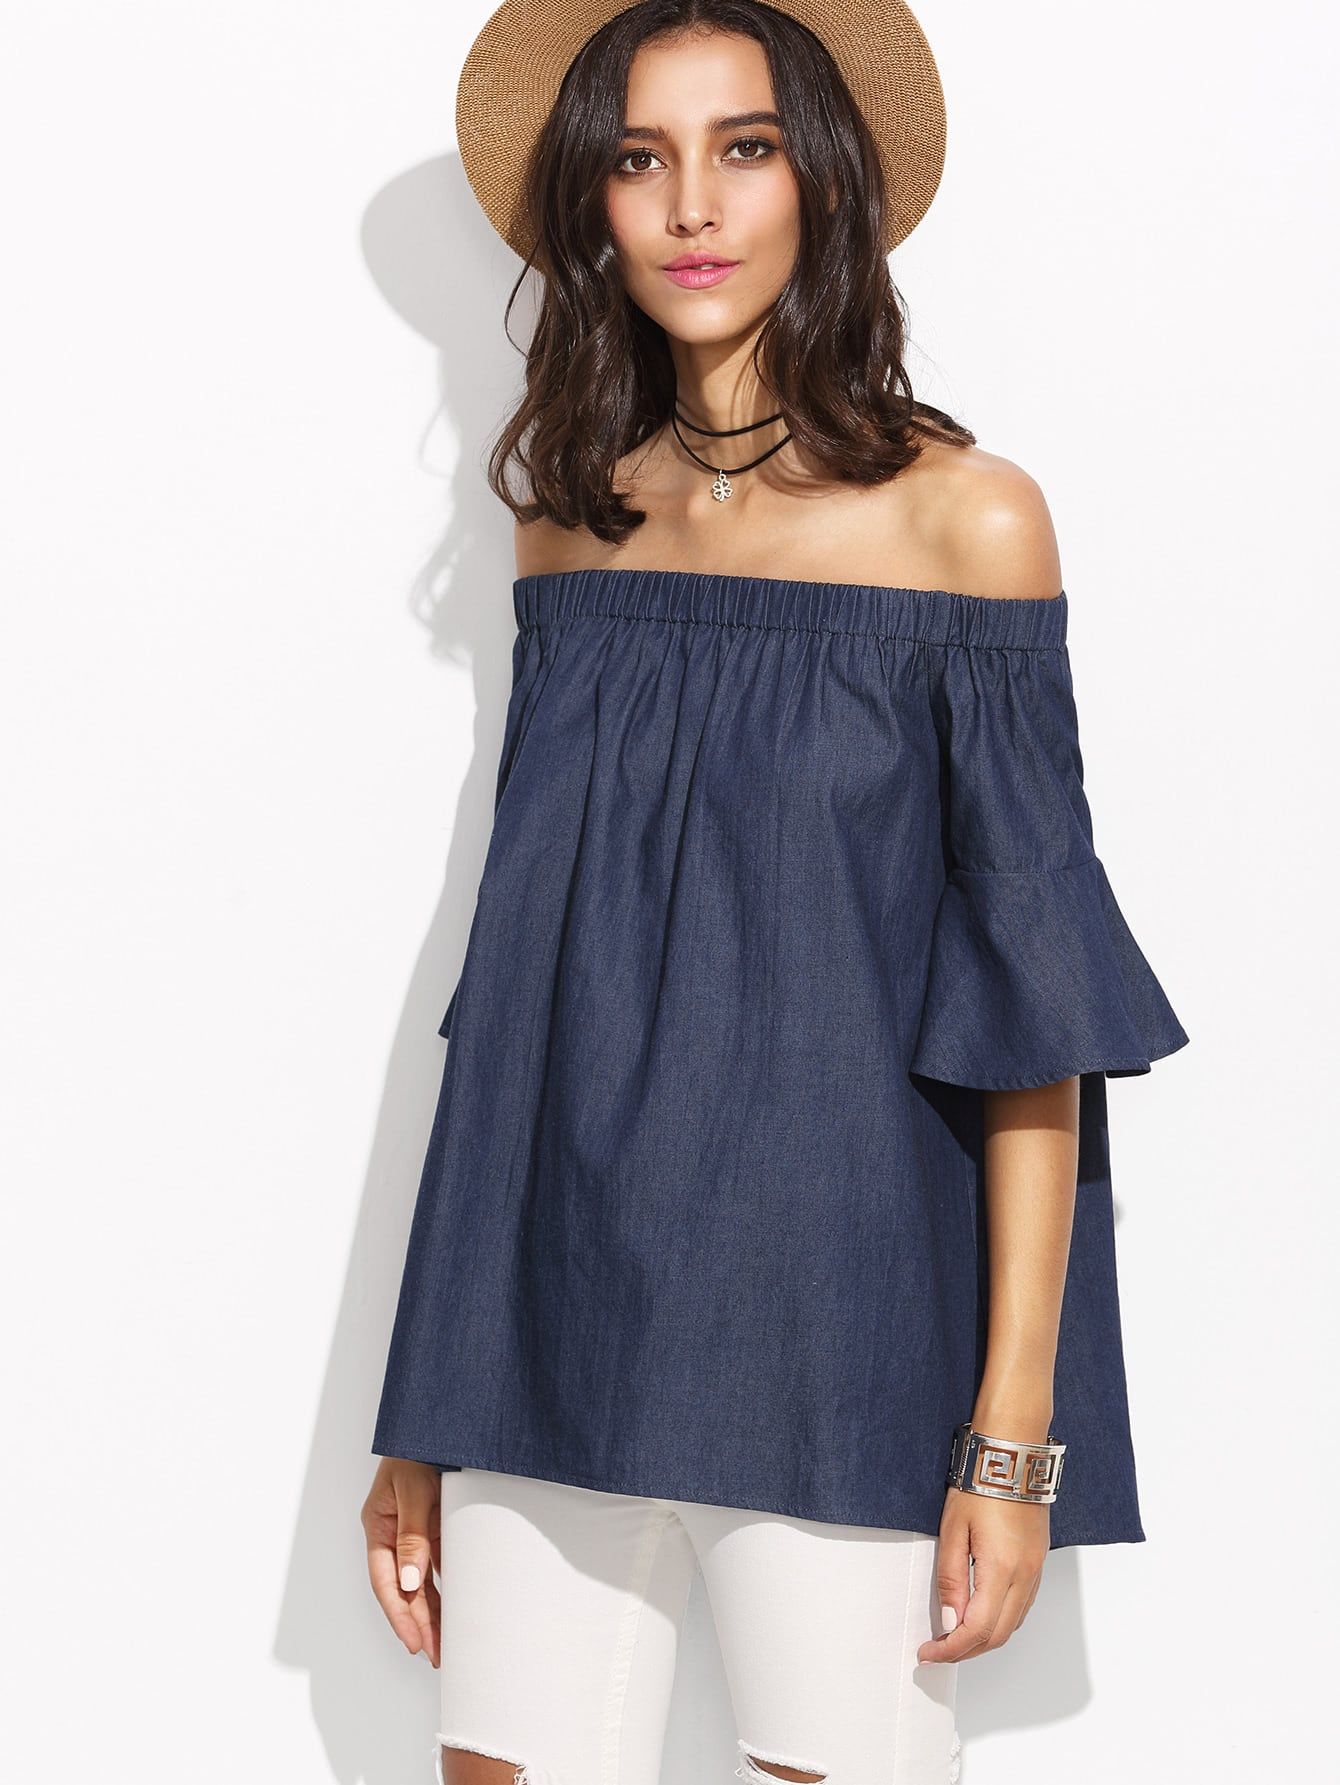 blouse160812702_2